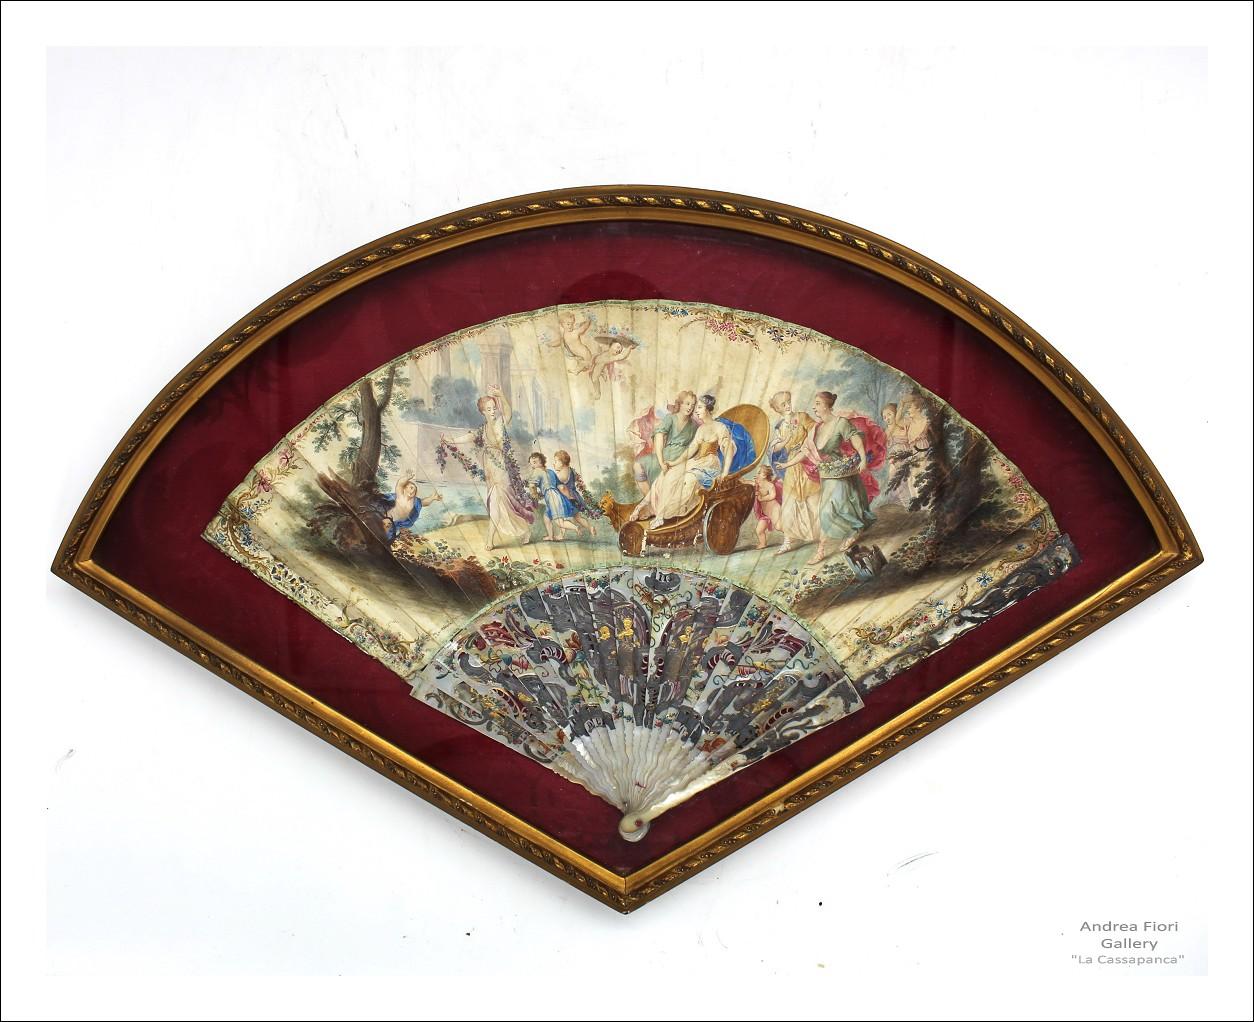 Antico Ventaglio dipinto - madreperla incisa - epoca XIX secolo